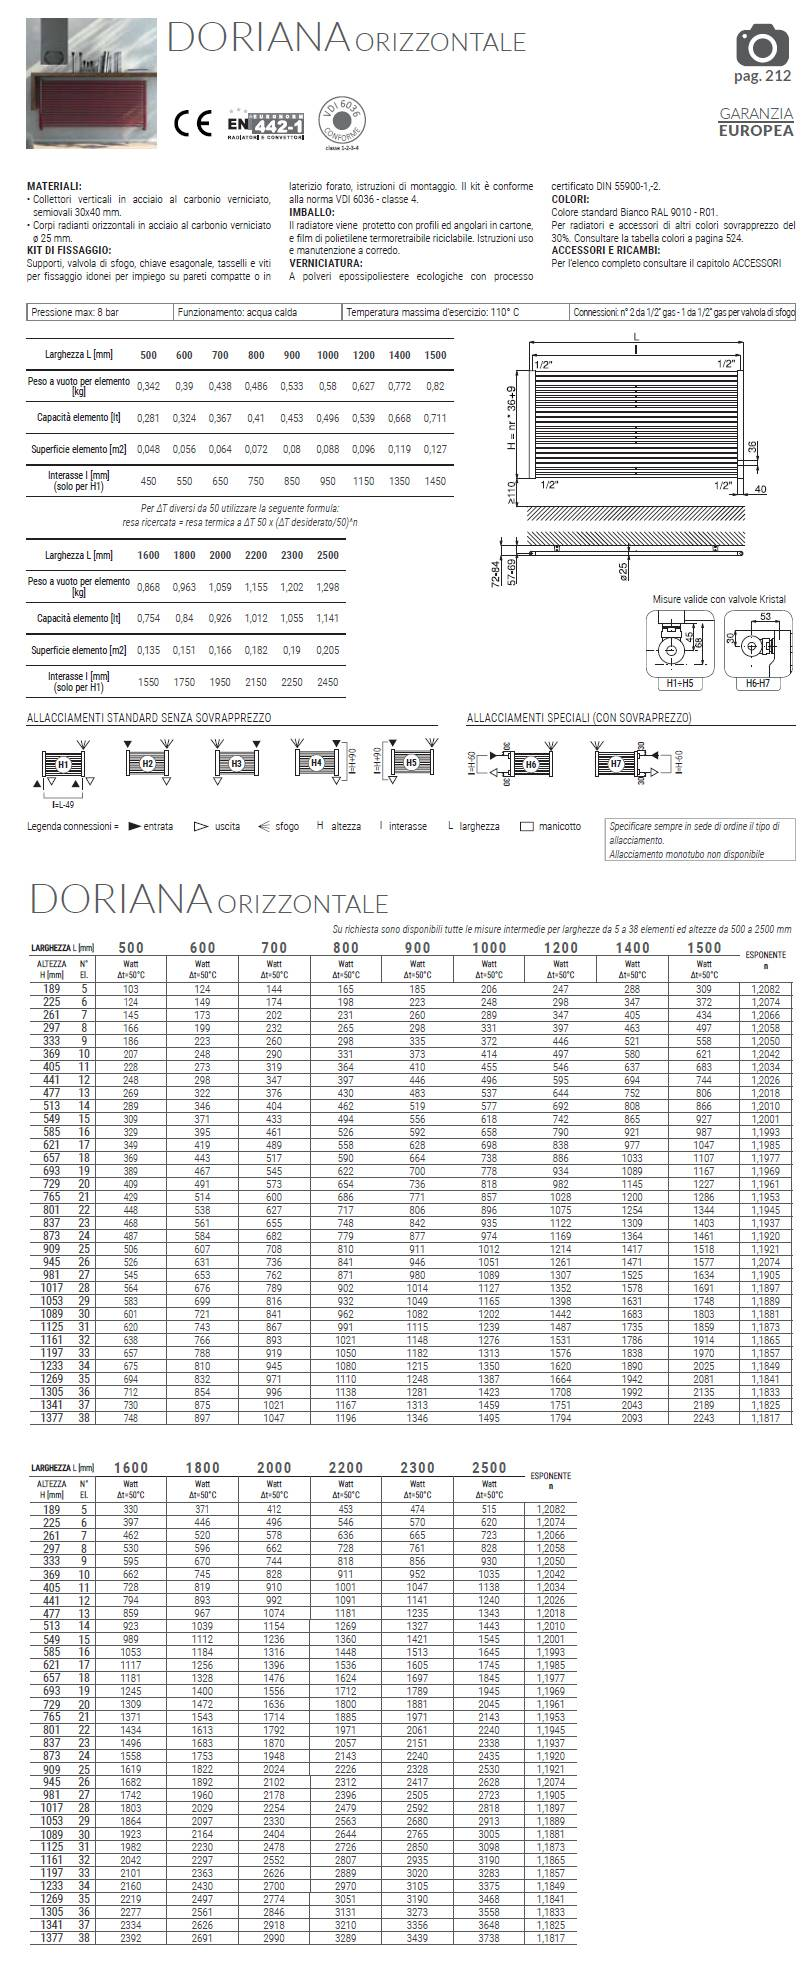 Bleet-Tenica-Heizkörper-Tulle-Warmers-Doriana-Horizontal-Cordivari